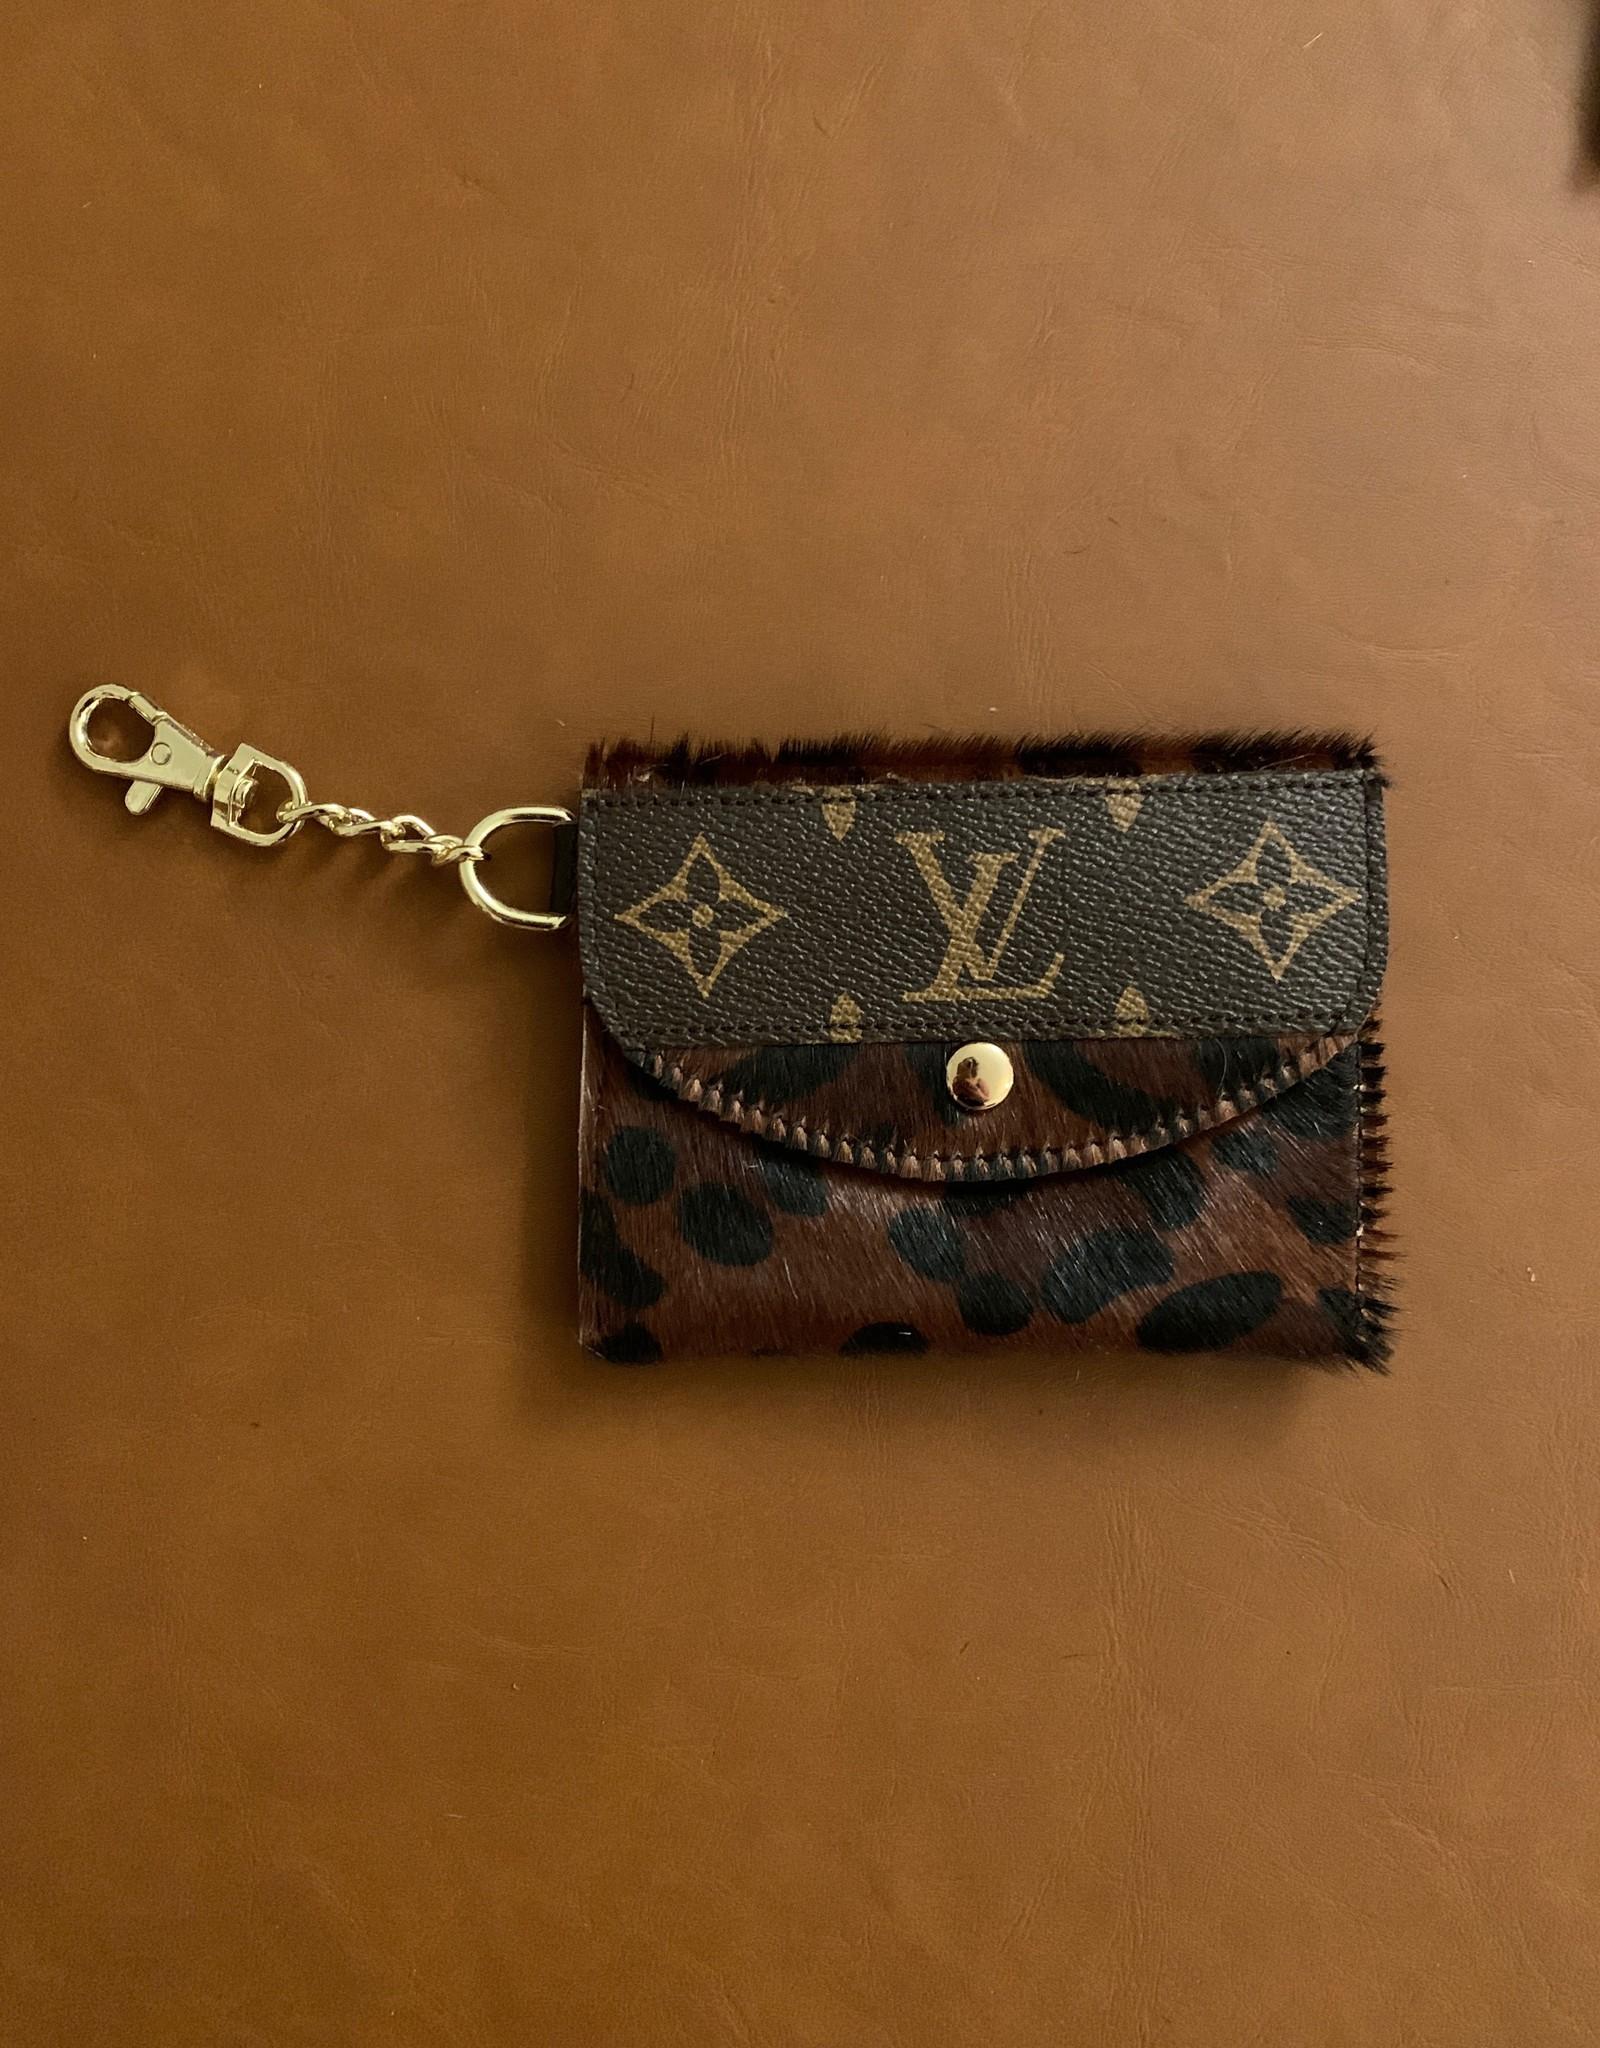 - Brown Large Cheetah Print Upcycled Louis Vuitton Cardholder